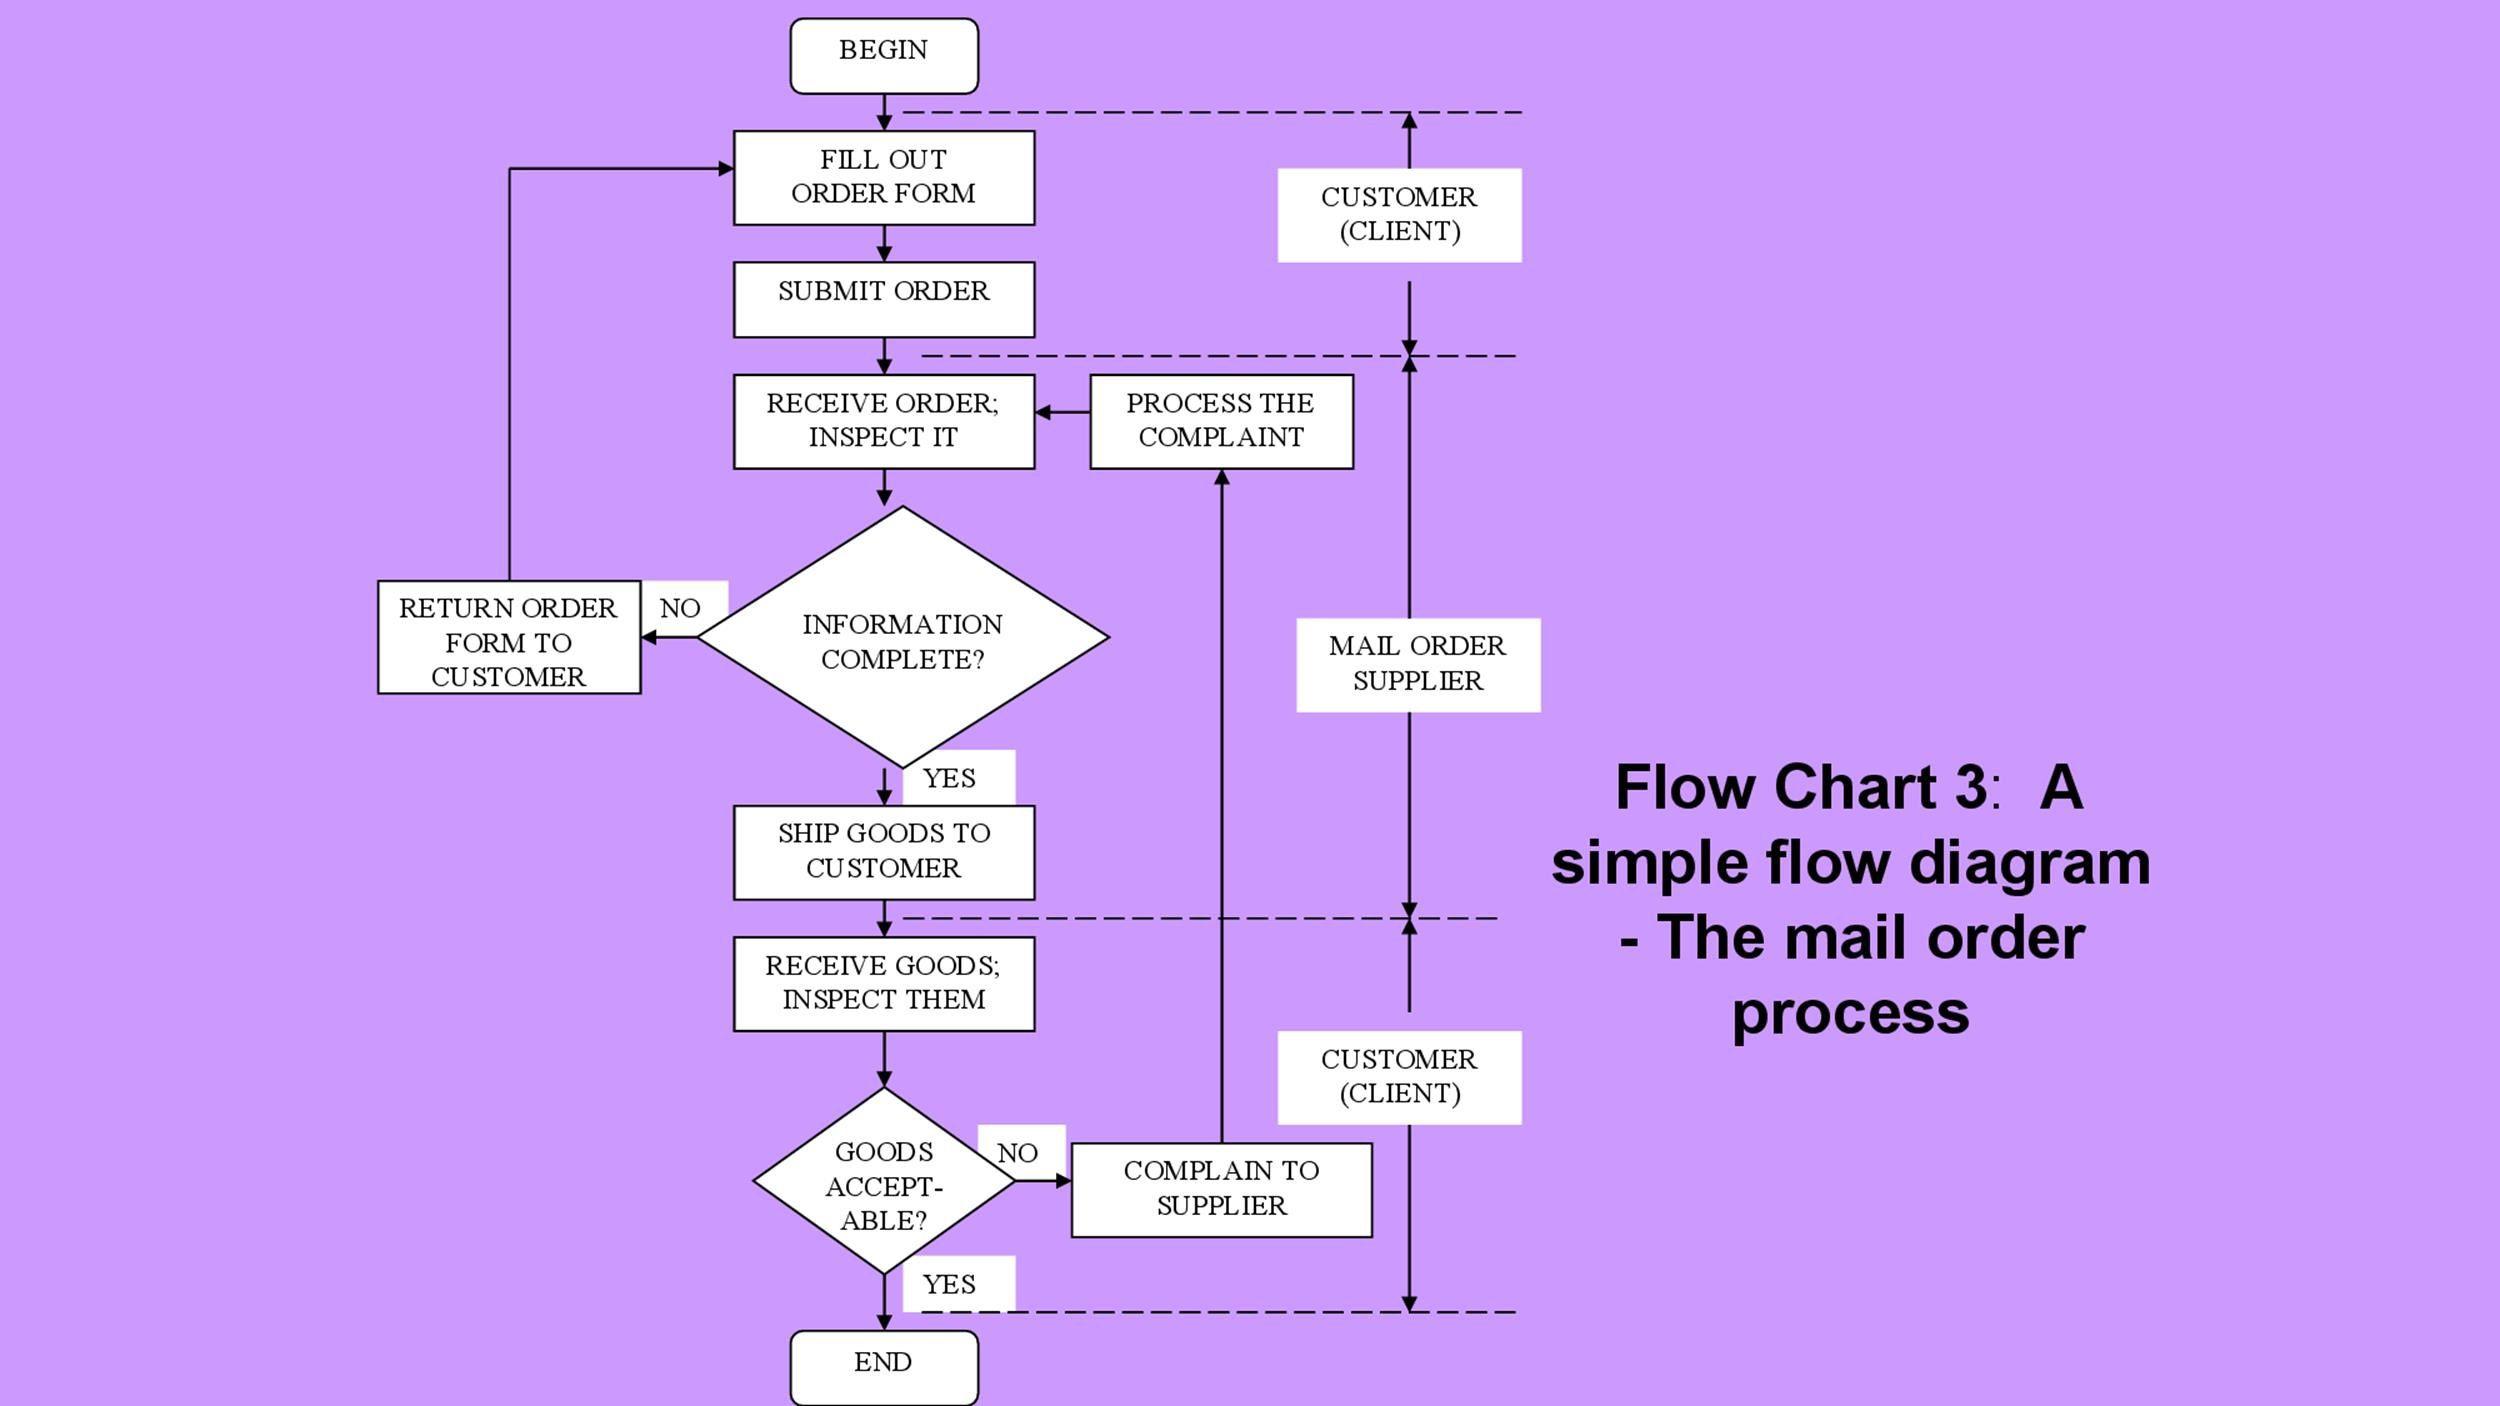 006 Singular Free Flowchart Template Word High Definition  Proces MicrosoftFull